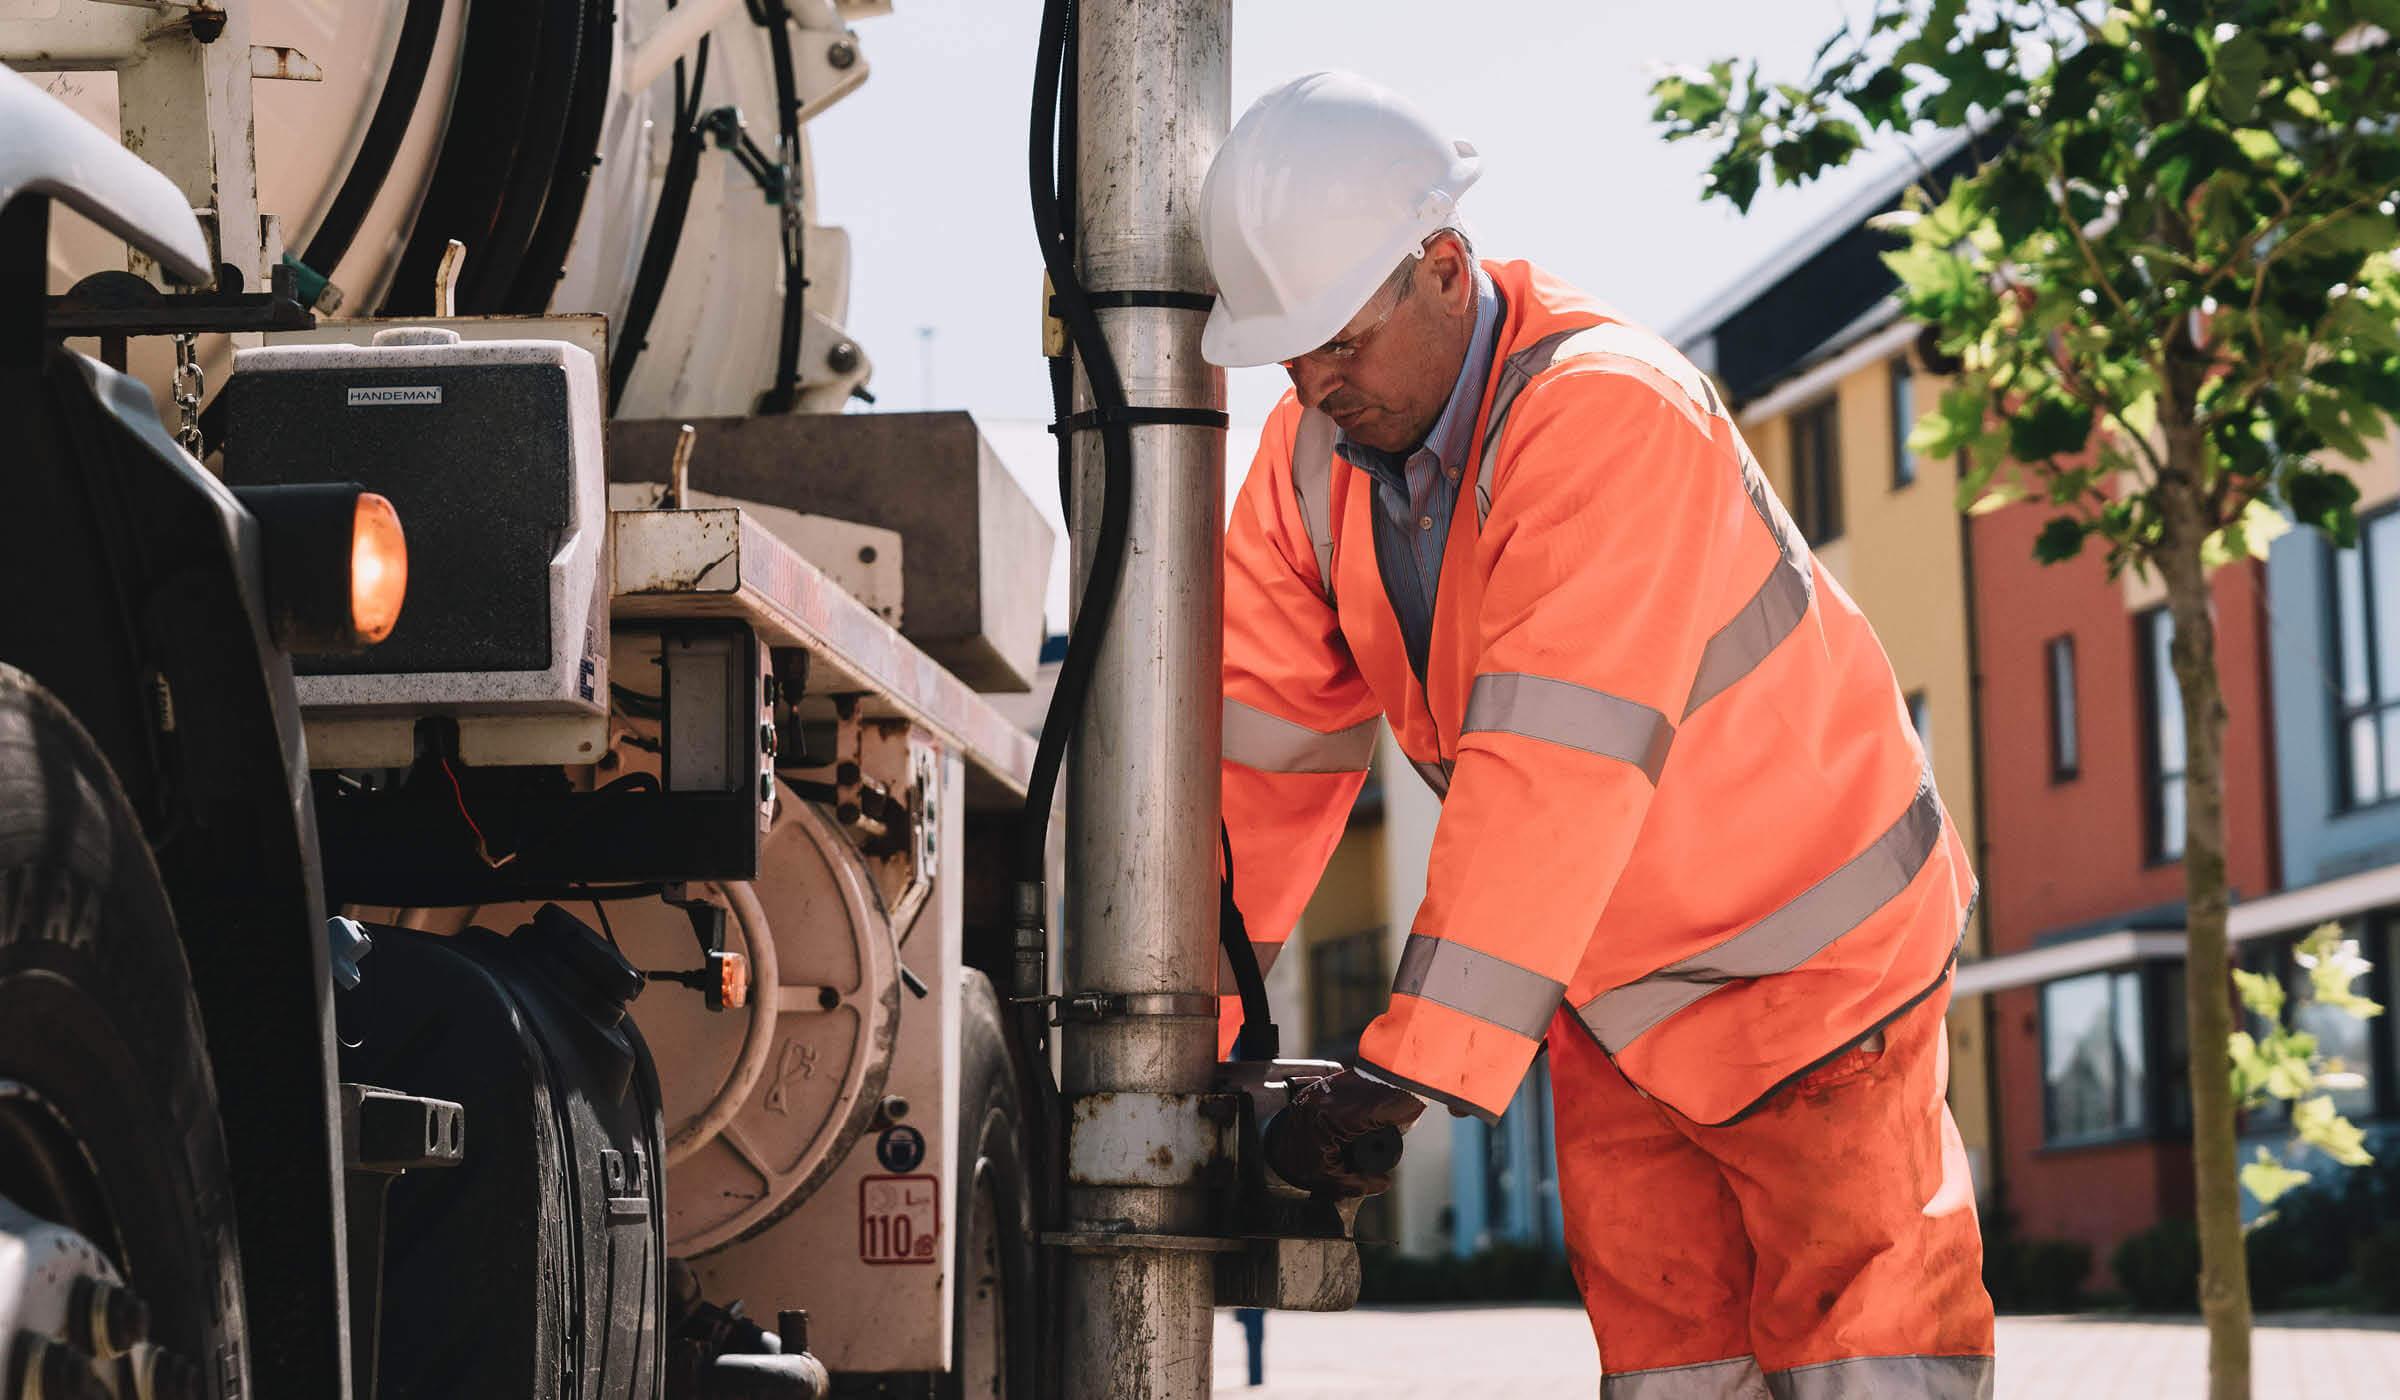 photograph of Bristol based environmental services vehicle sucking up sewage